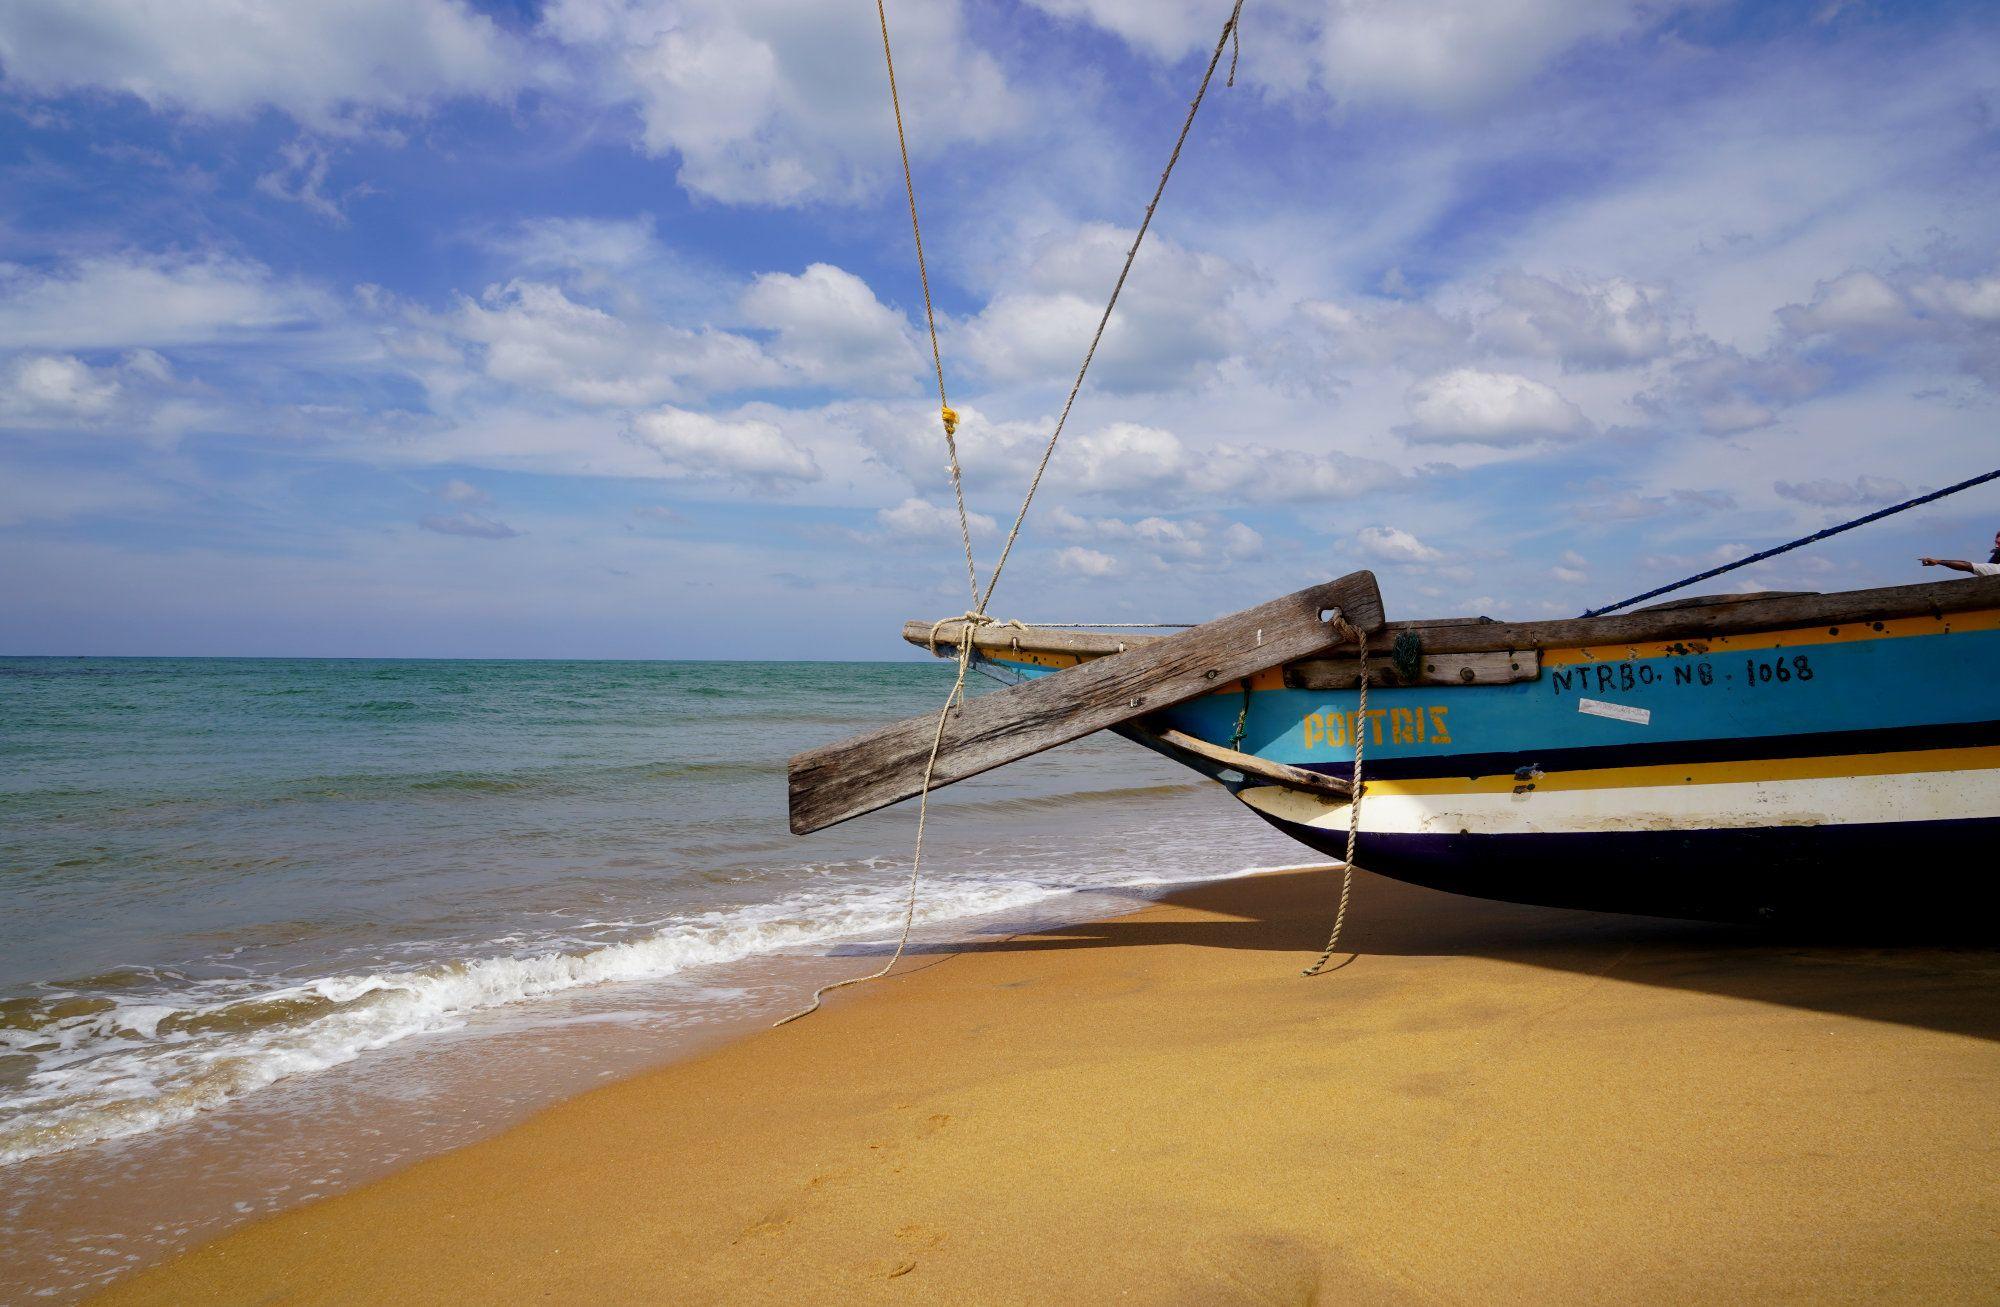 Negombo Segelboot Strand